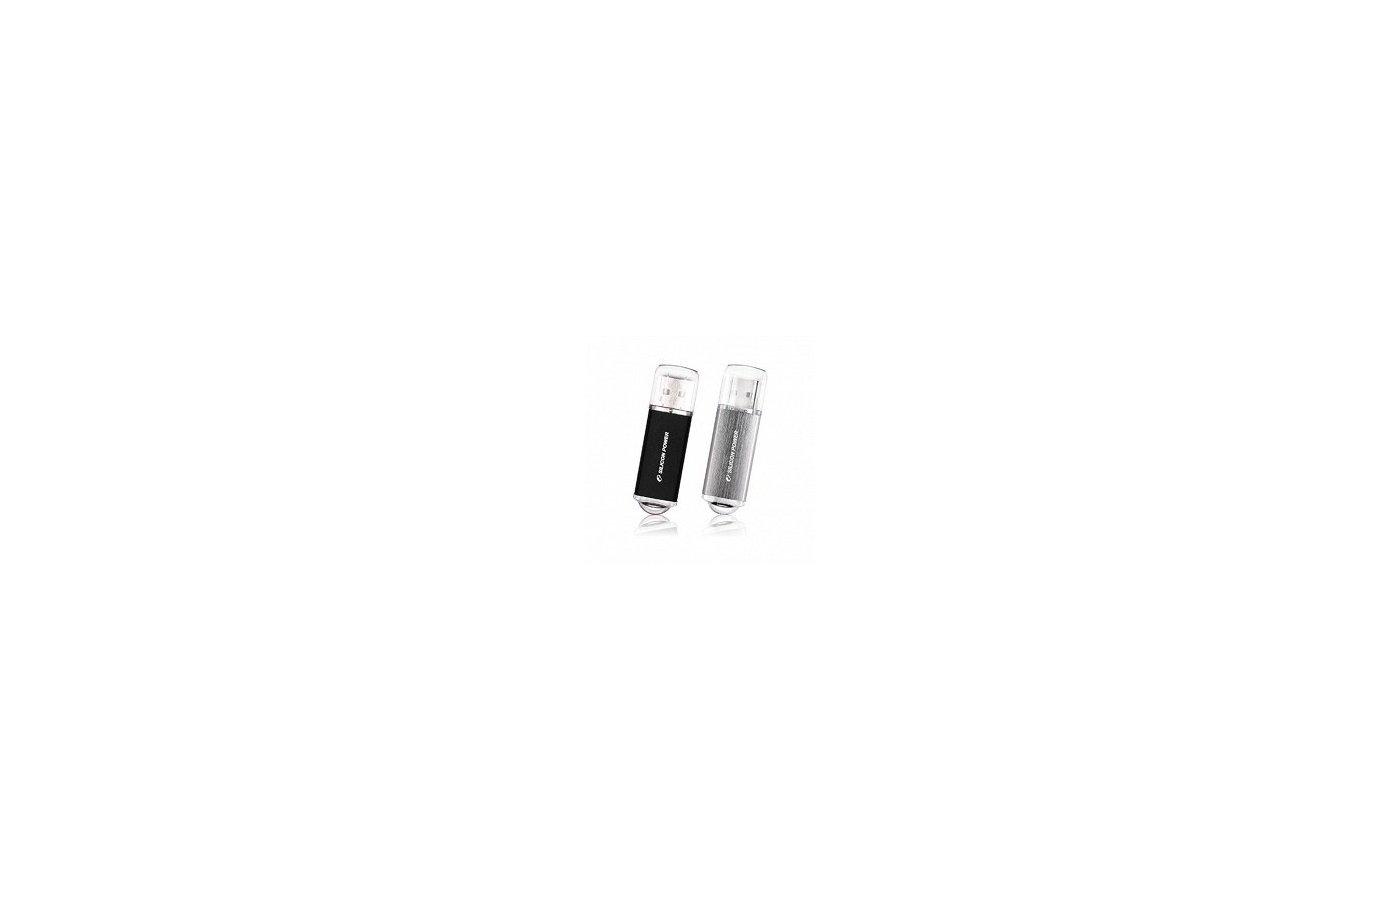 Флеш-диск USB2.0 Silicon Power 16Gb ULTIMA II-I Series SP016GBUF2M01V1S серебристый